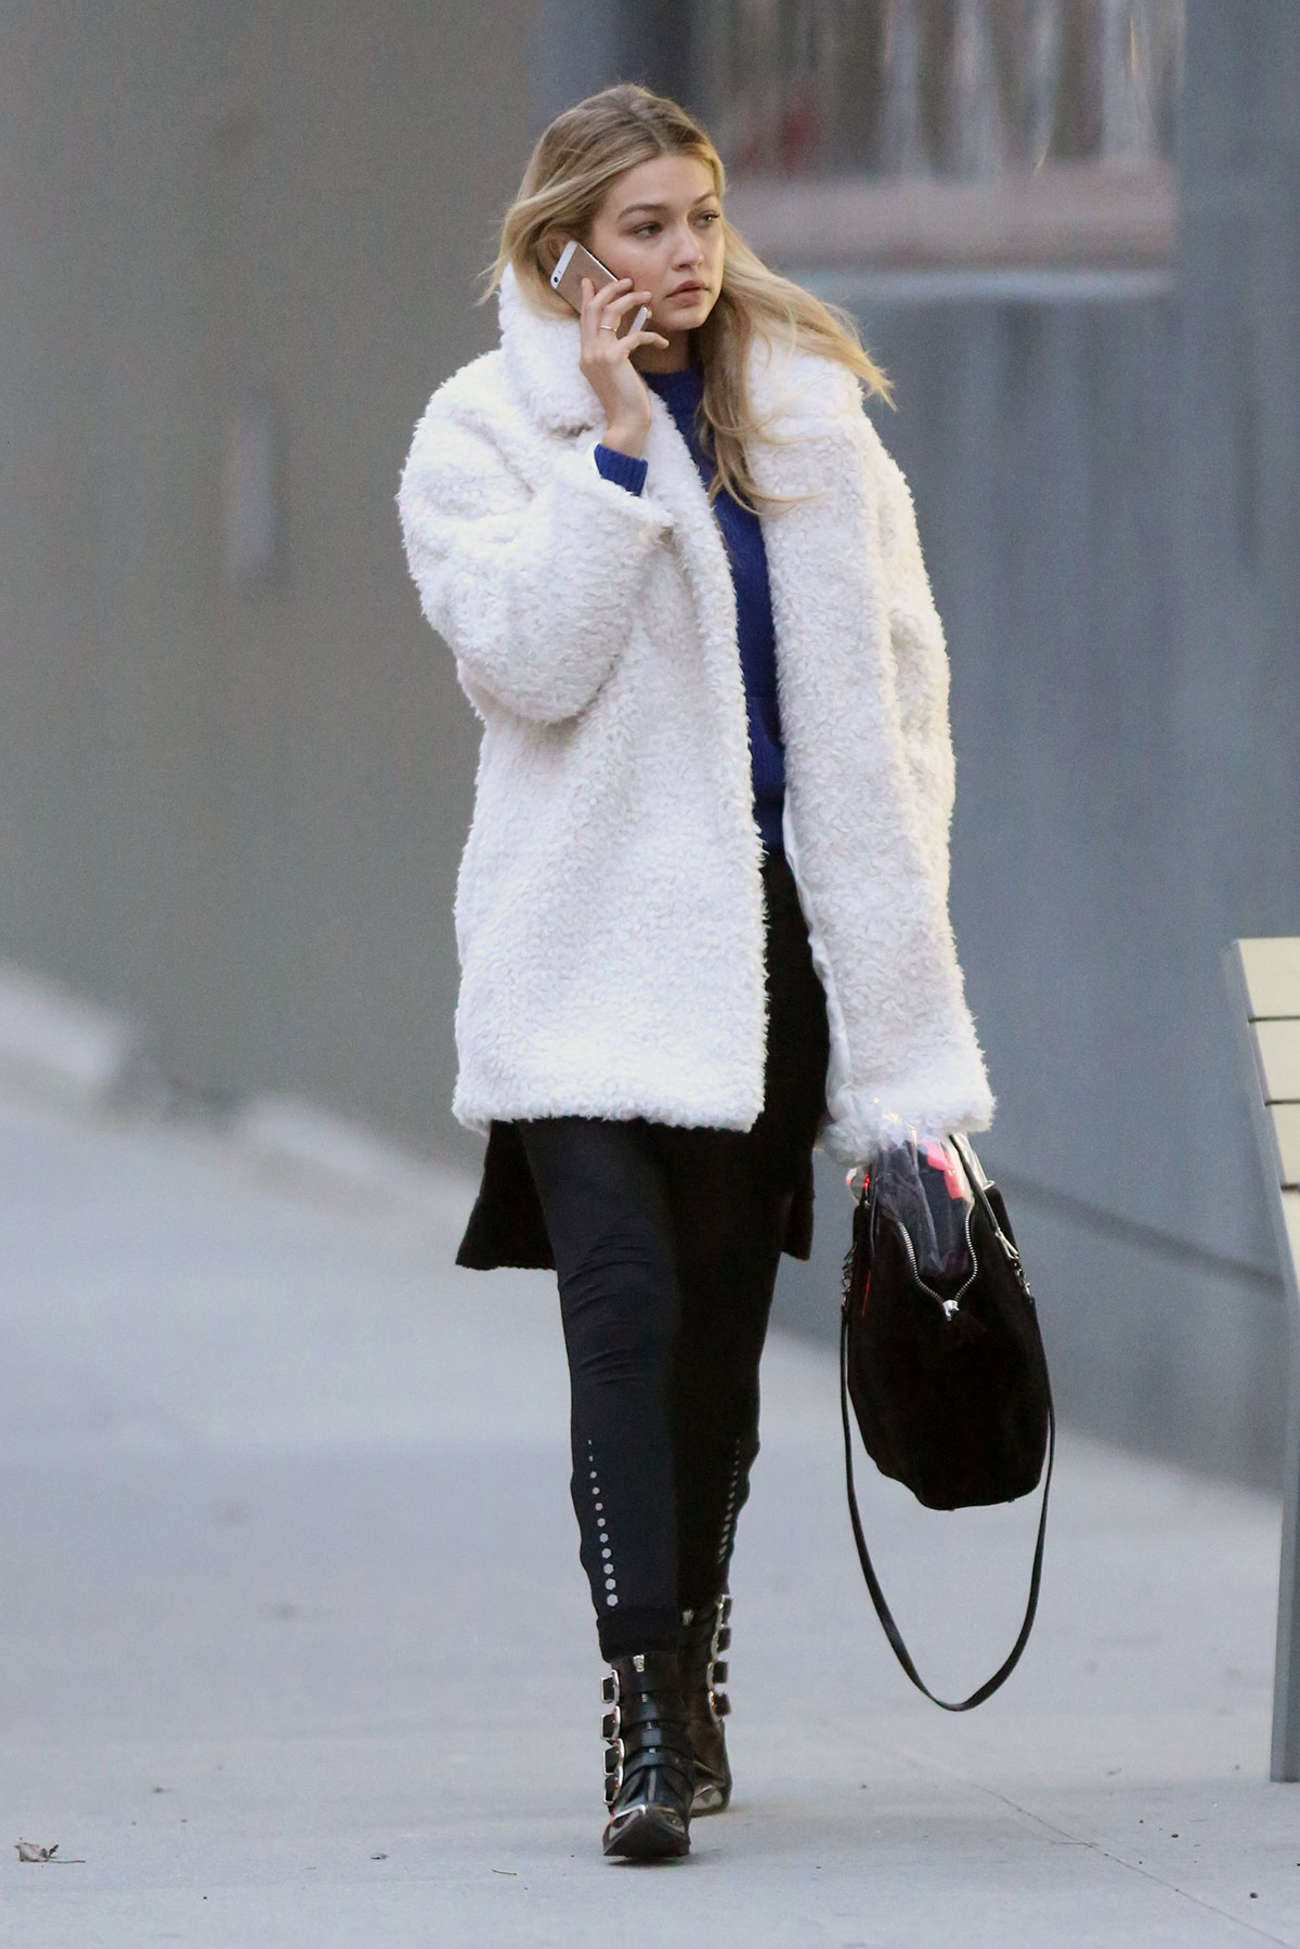 Gigi Hadid 2014 : Gigi Hadid in Mini Skirt -12